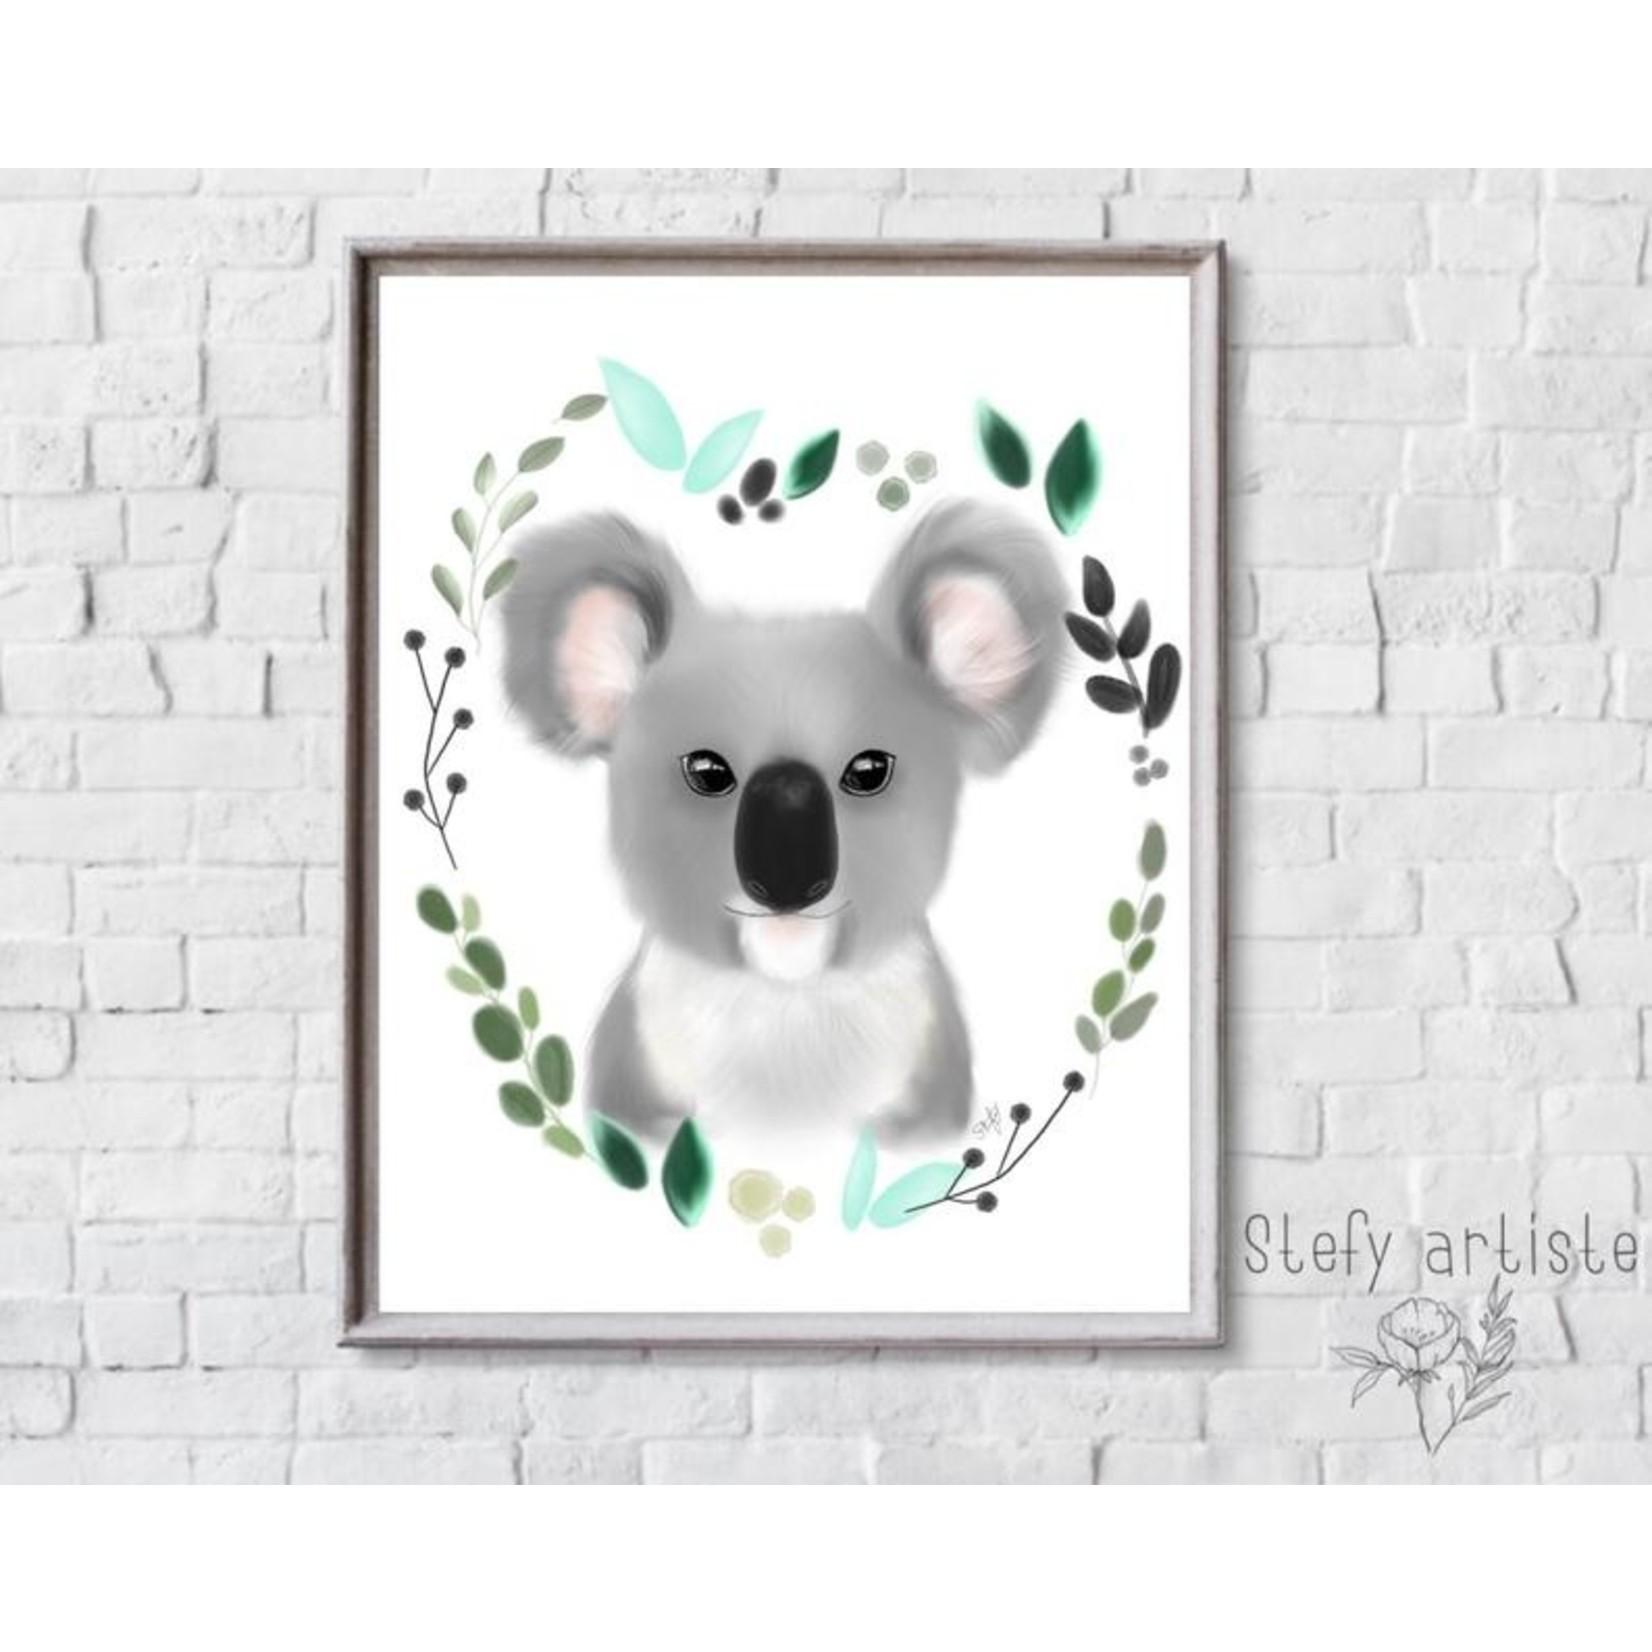 Stefy Artist || Illustration Koala feuille